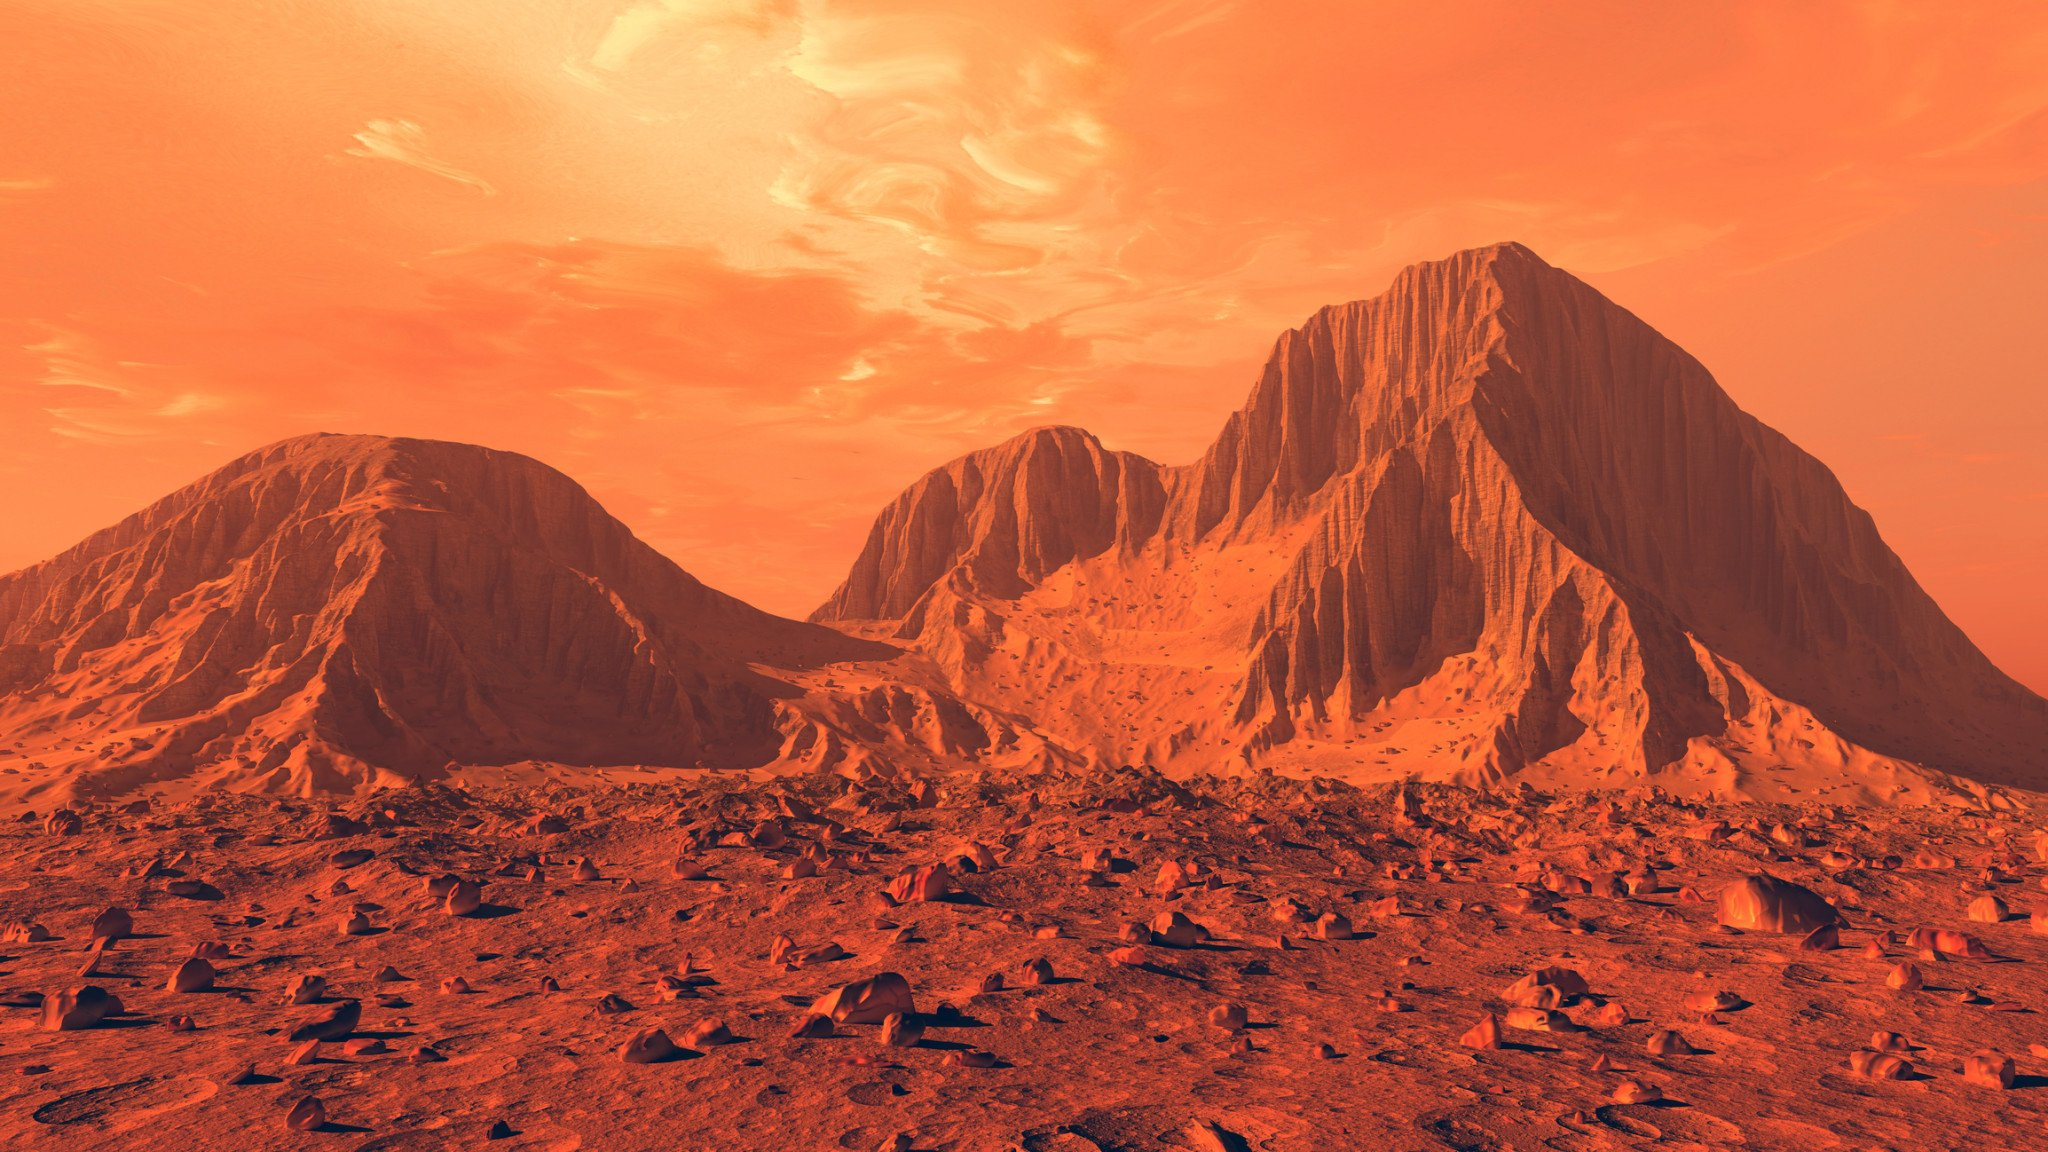 mars landscape images - HD2048×1152